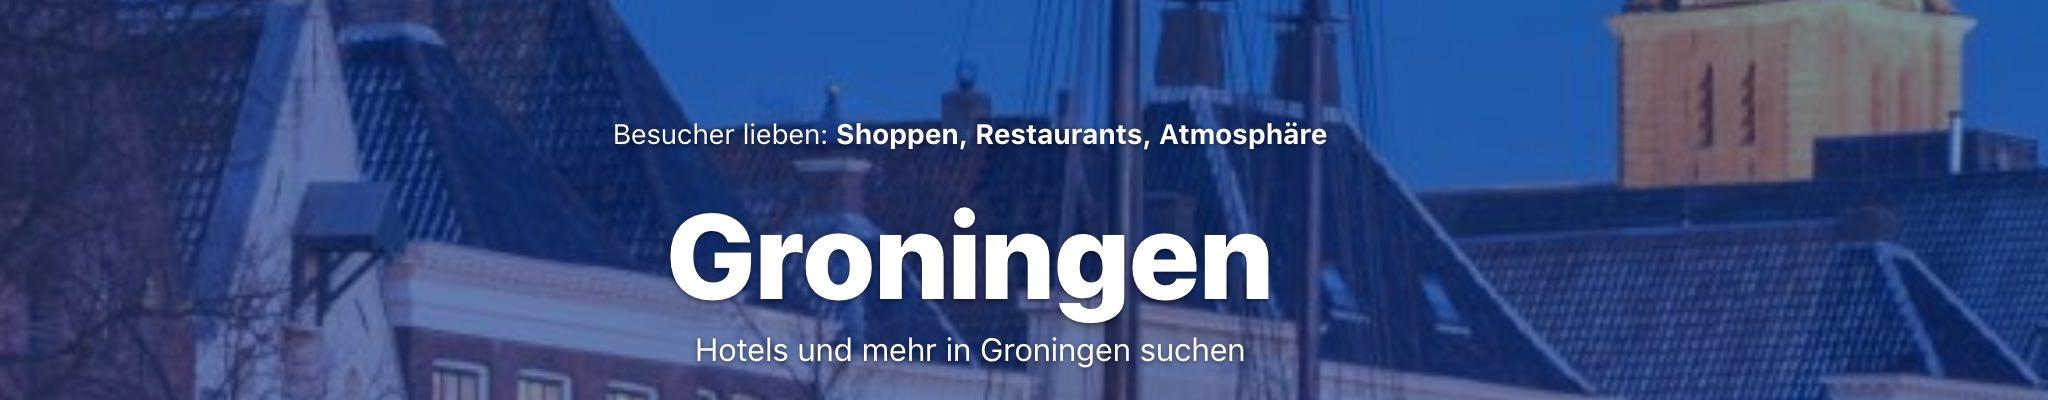 Groningen - Bookings.com - Hotels - Suche